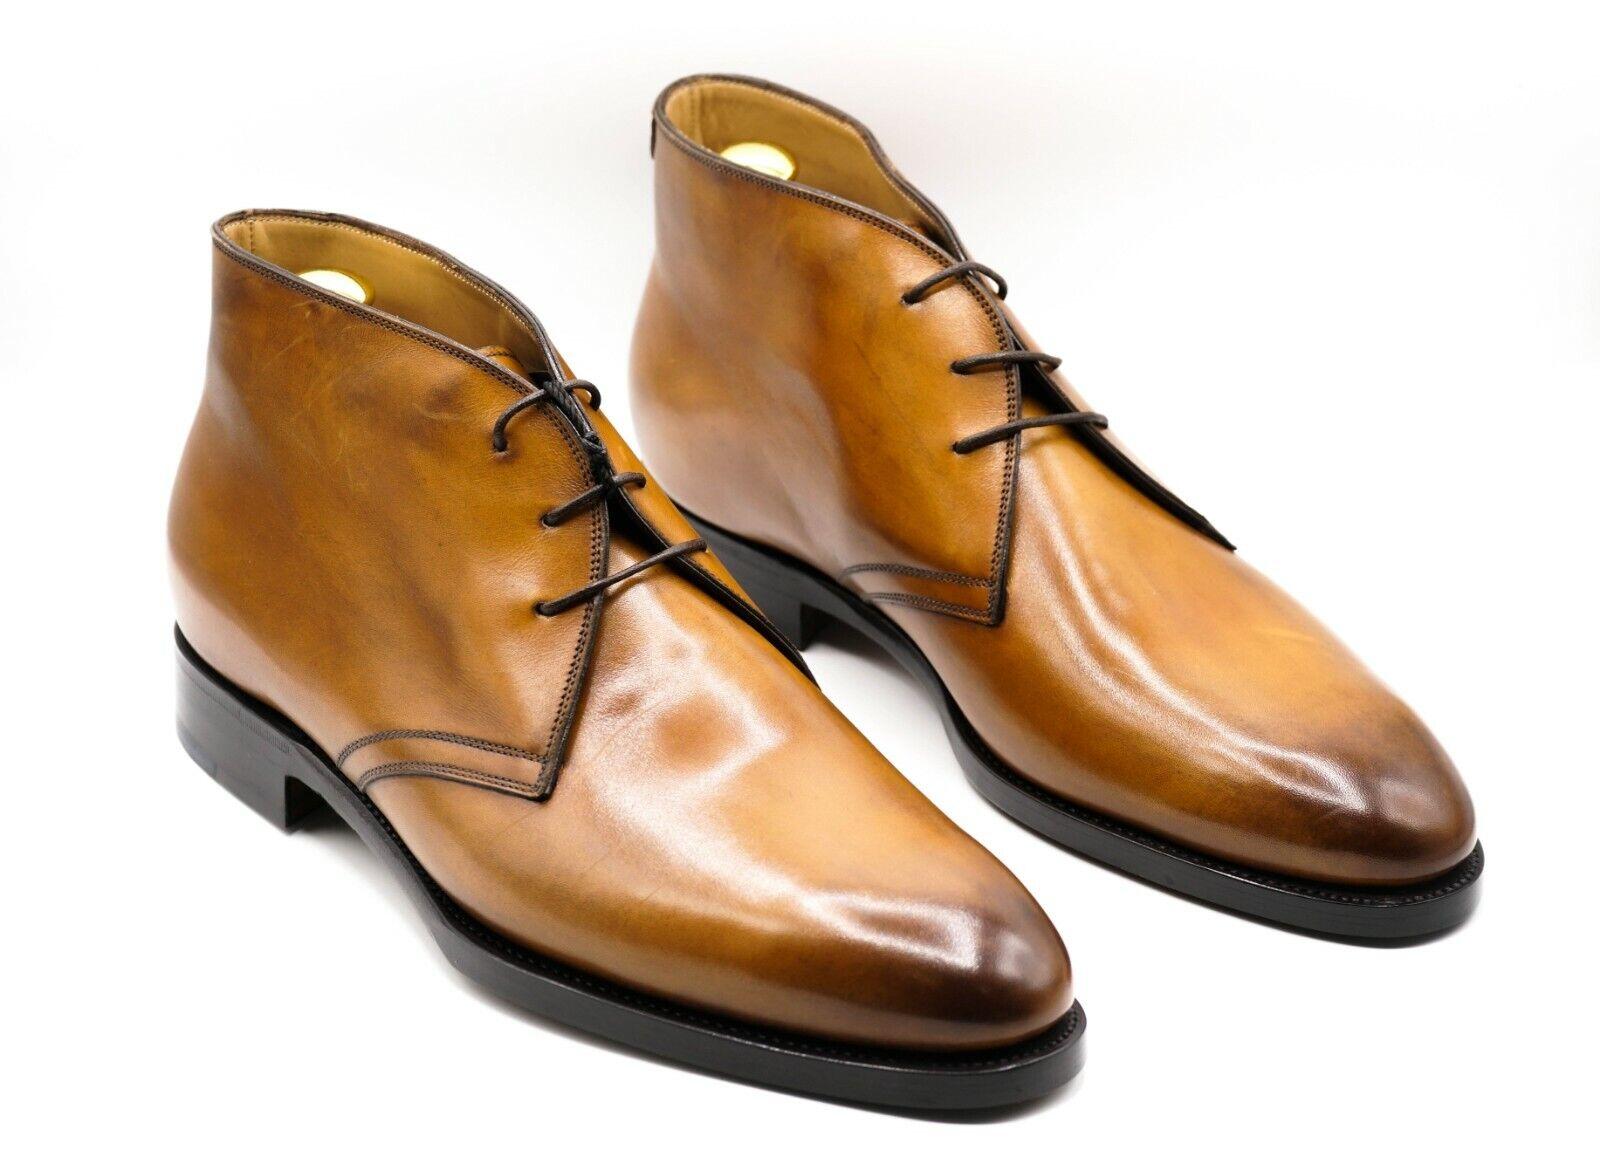 NEW KITON Napoli Dress Leather Shoes Size Eu 44 Uk 10 Us 11 (KIS50)